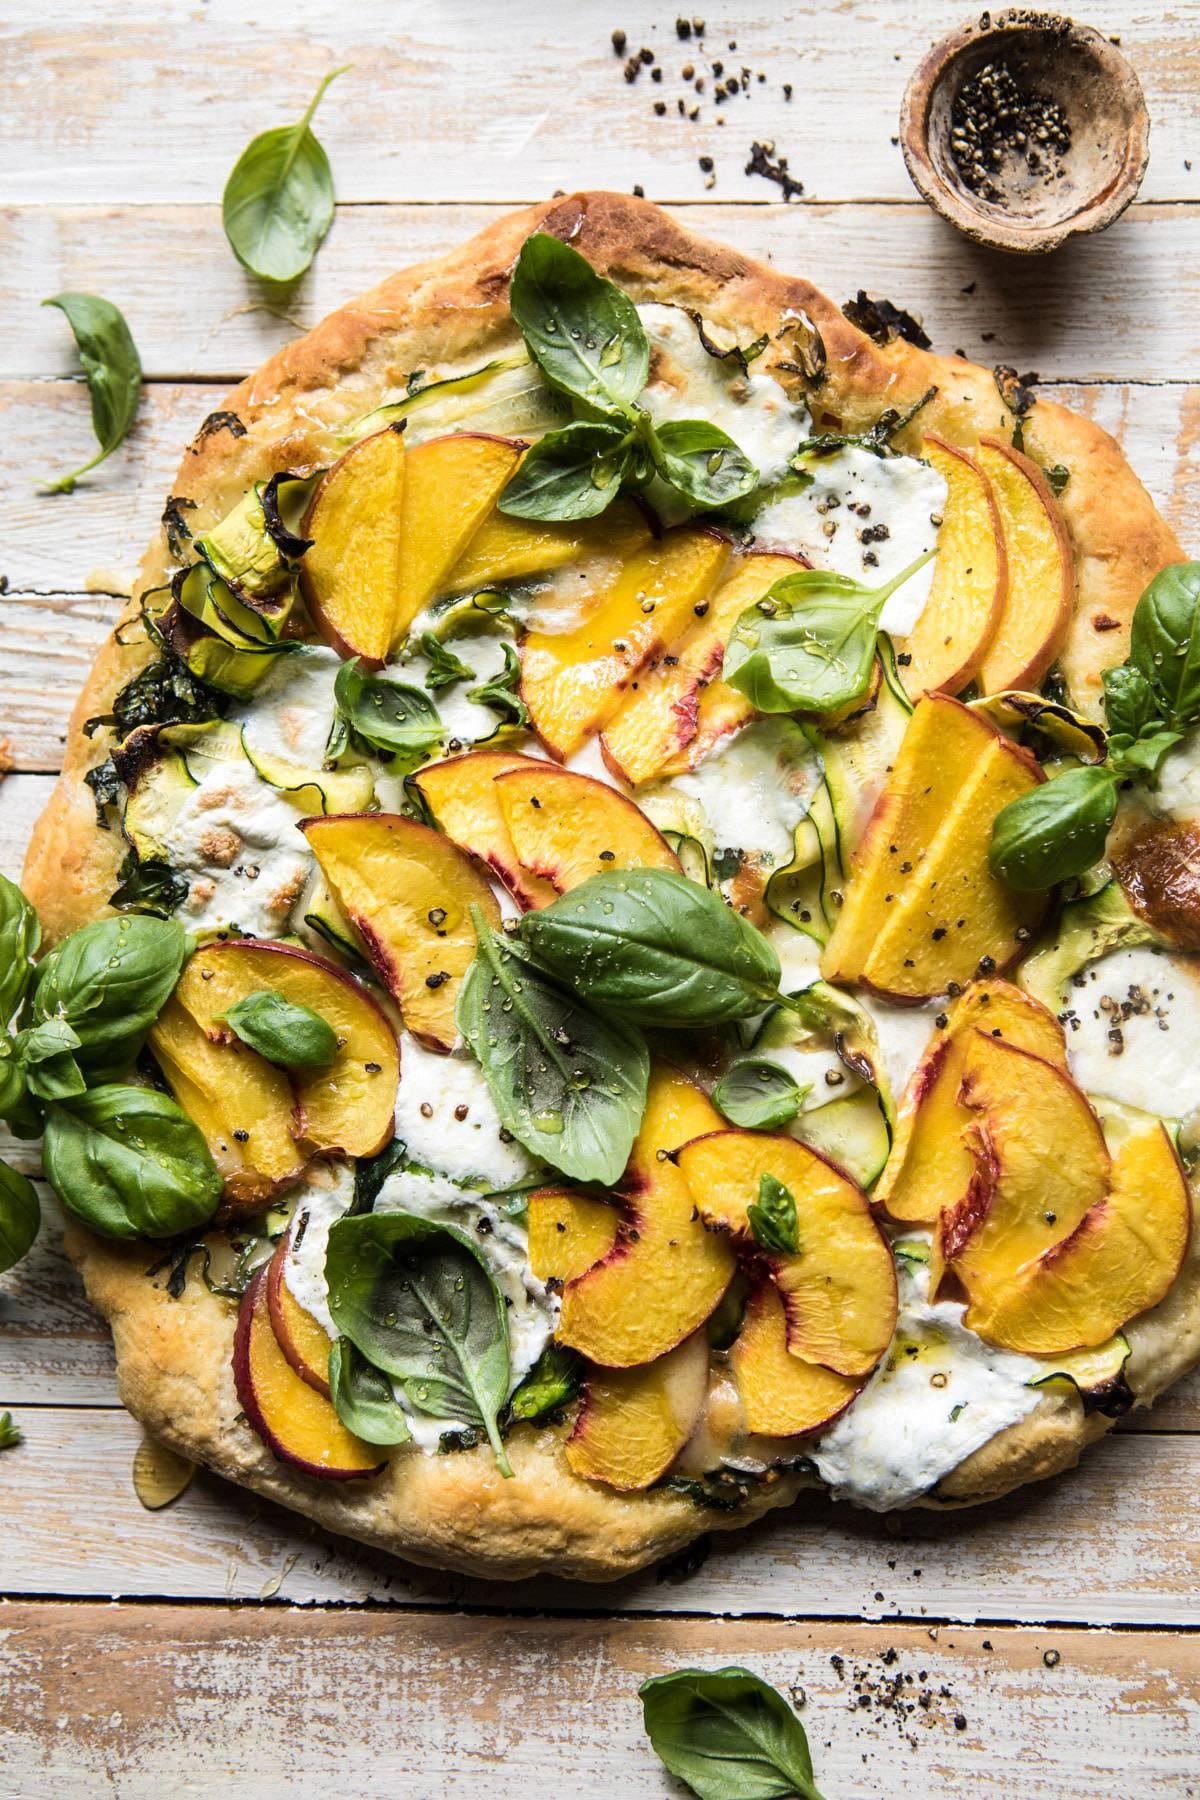 Pesto Zucchini and Peach Pizza with Burrata | halfbakedharvest.com #peach #pizza #summer #easyrecipes